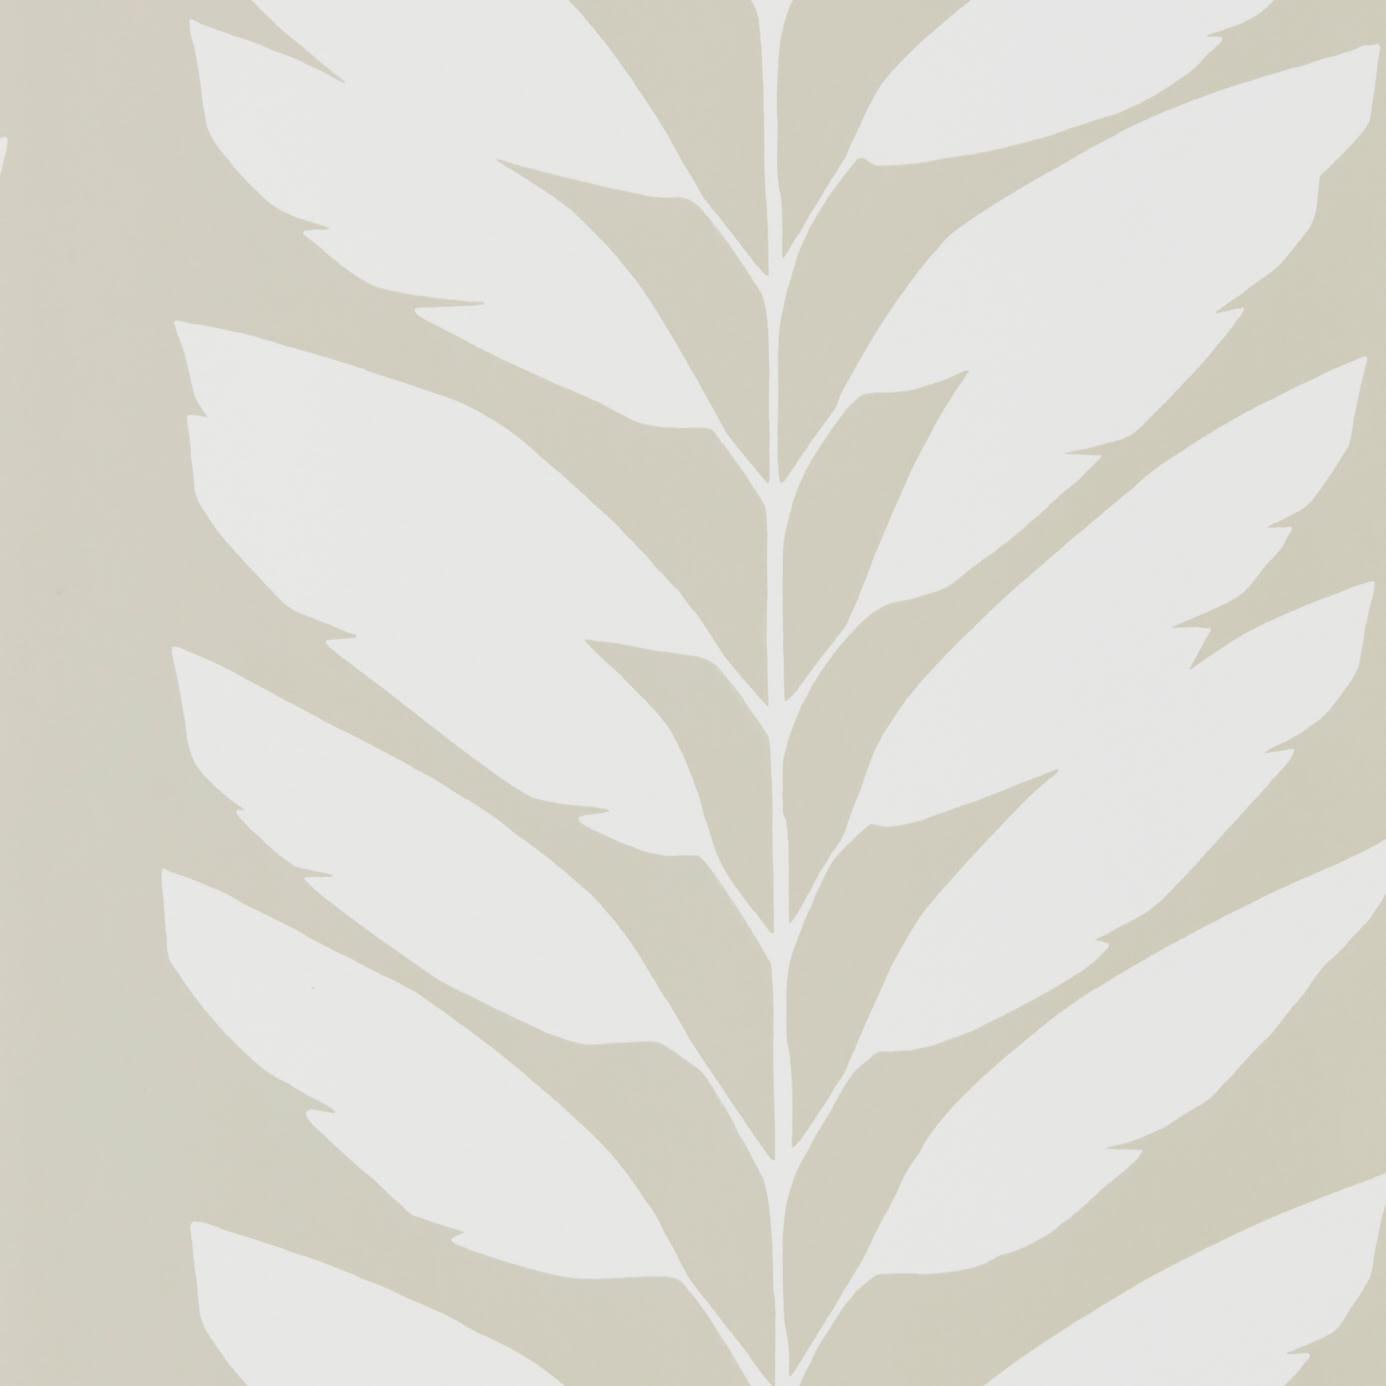 Английские обои Scion,  коллекция Lohko, артикул111312